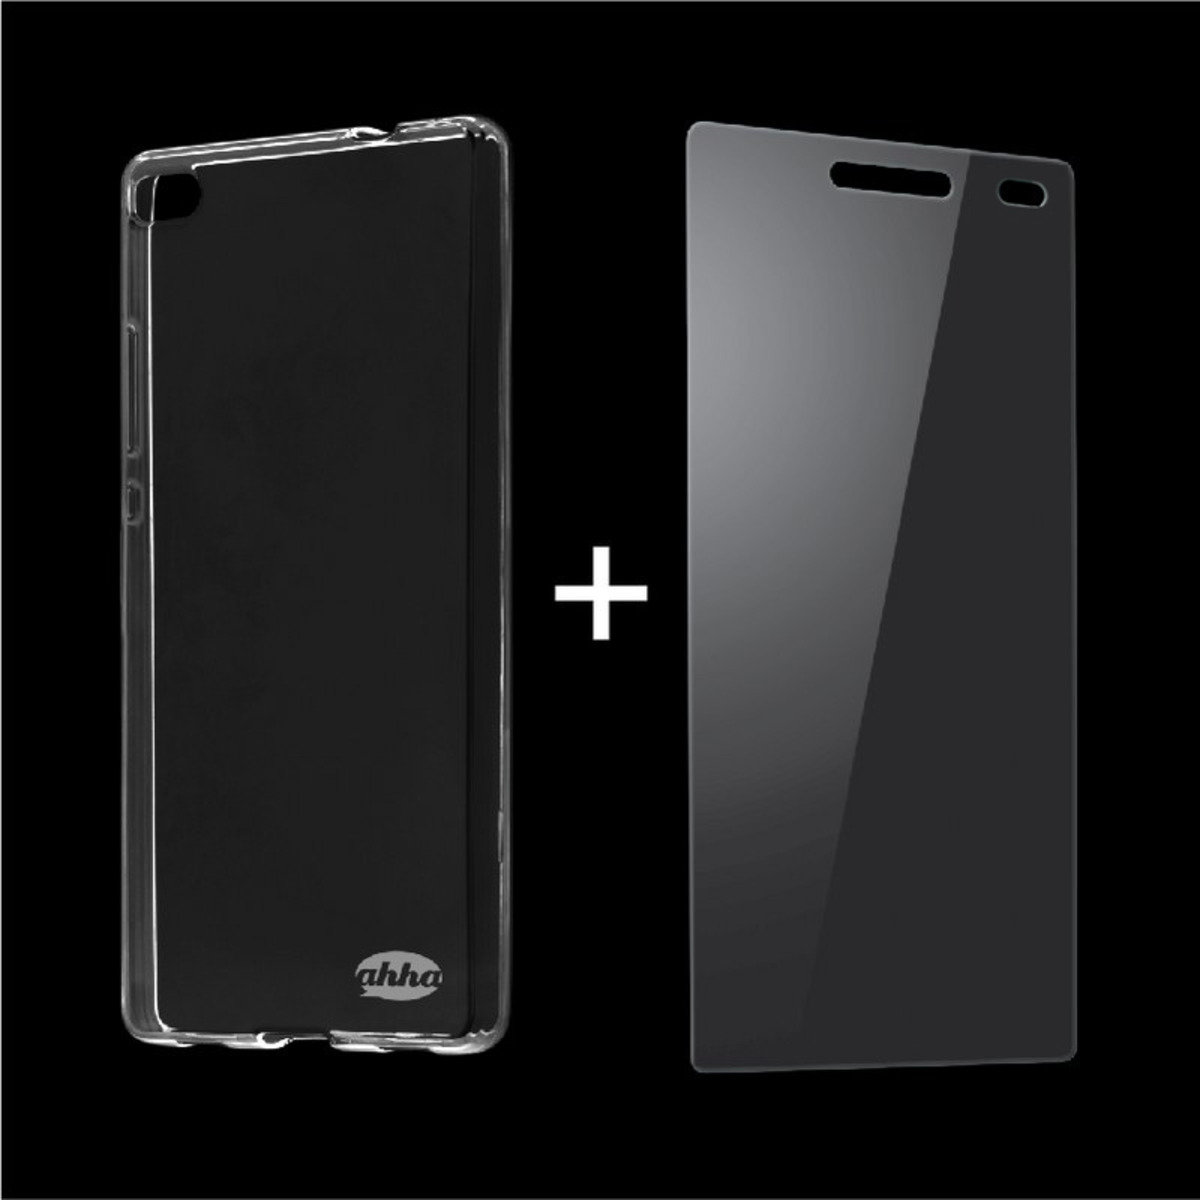 Huawei P8 Lite 手機保護殼 及 鋼化玻璃膜 套裝 (透明)